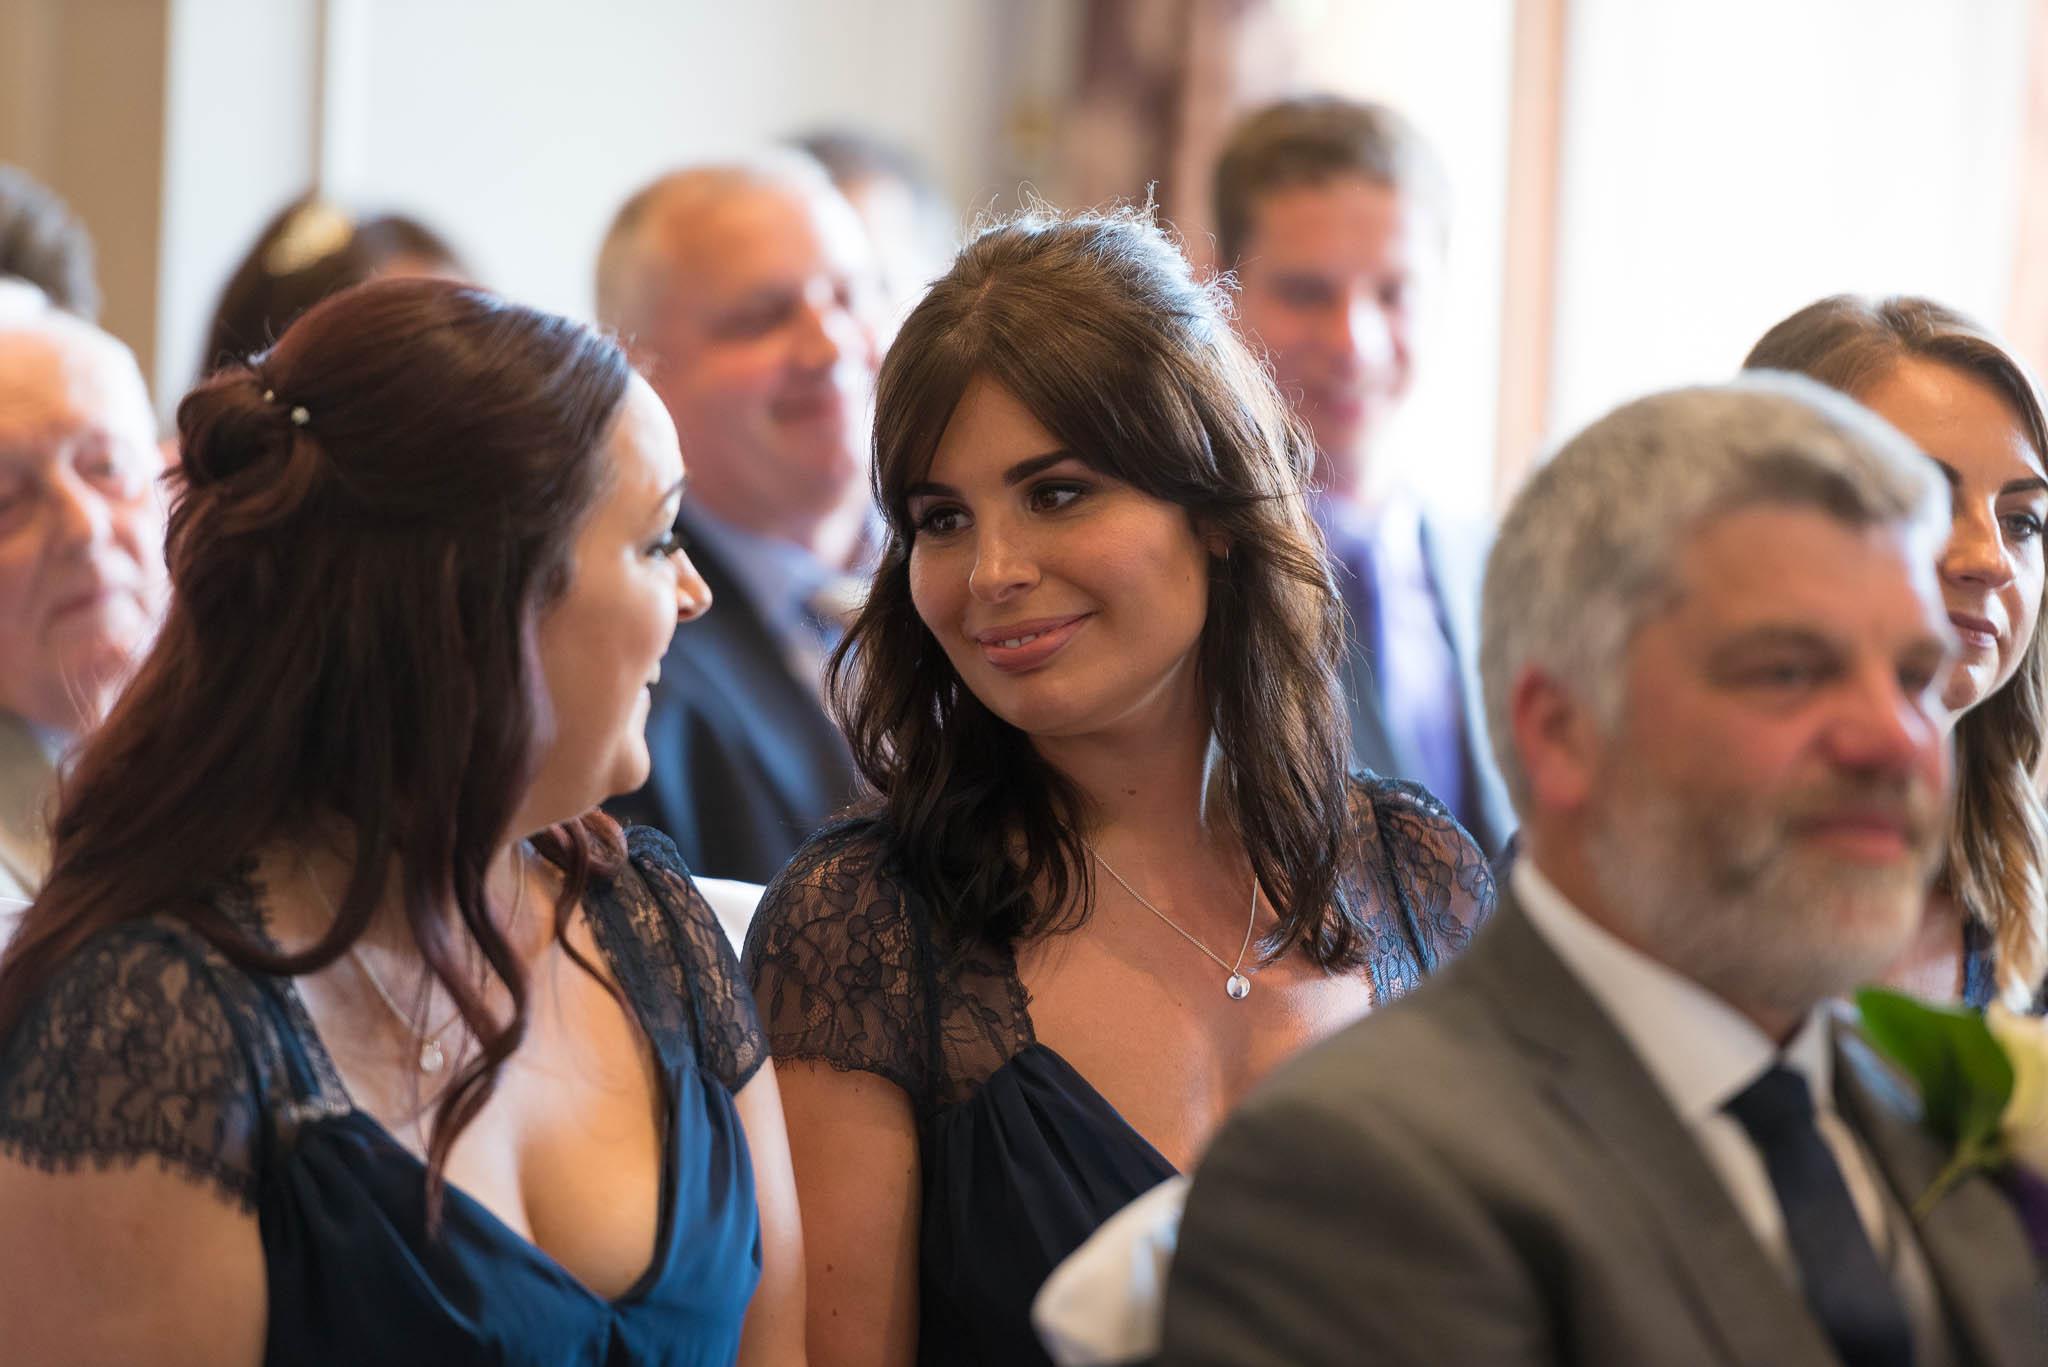 Crathorne Hall Hotel Wedding Photographer58.jpg